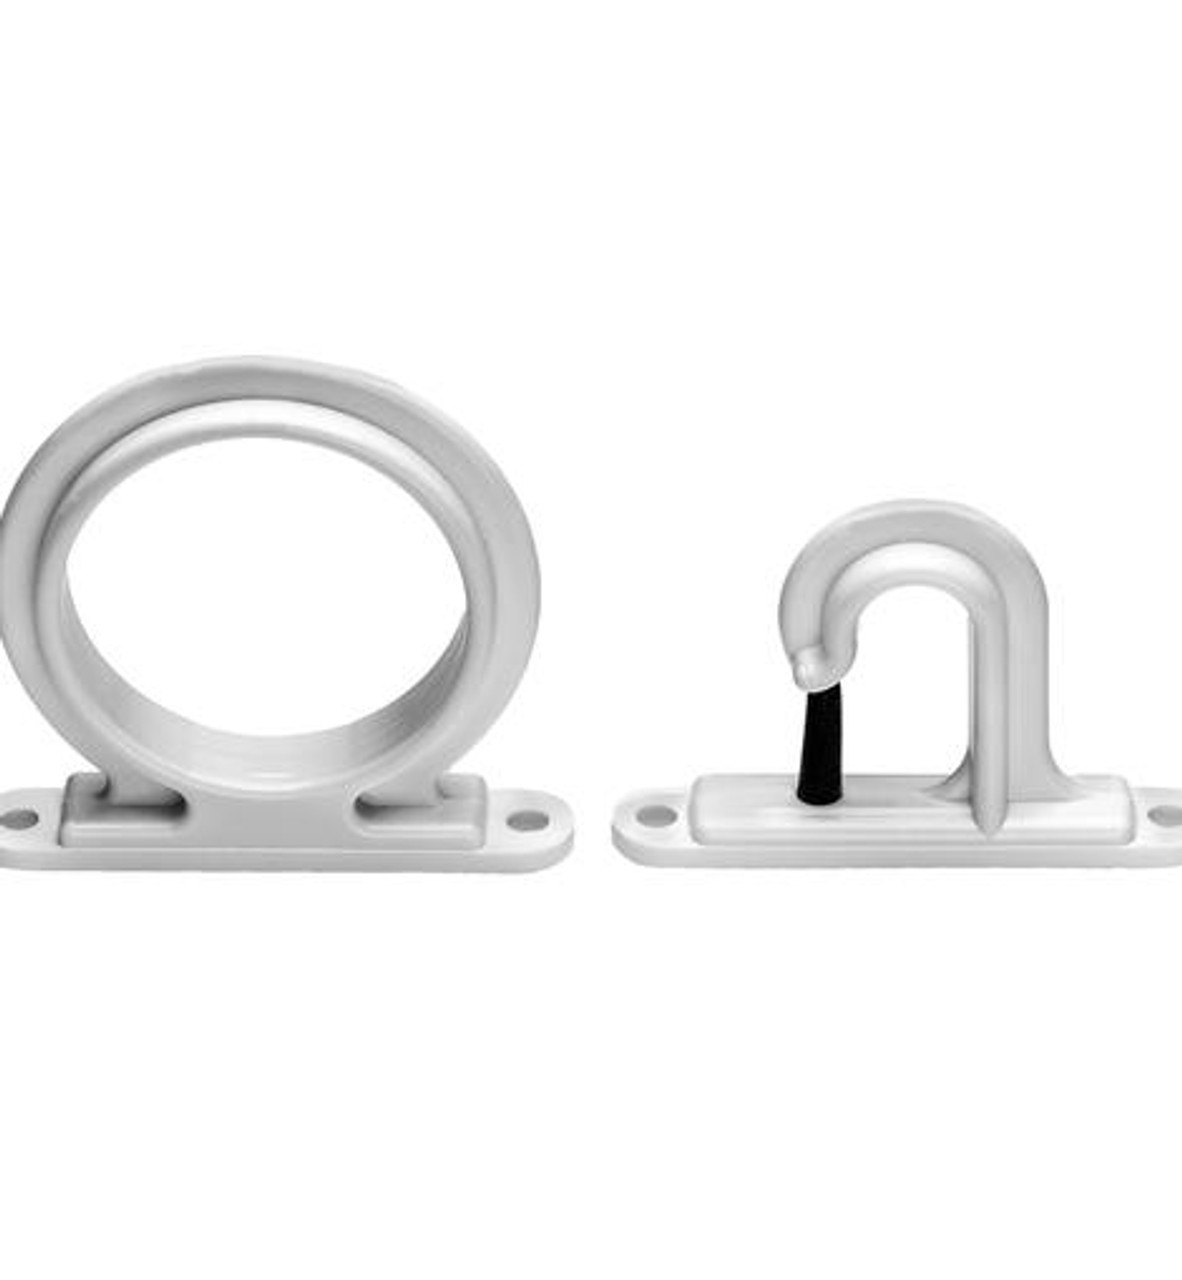 Rod Holder Storage - White 3pack